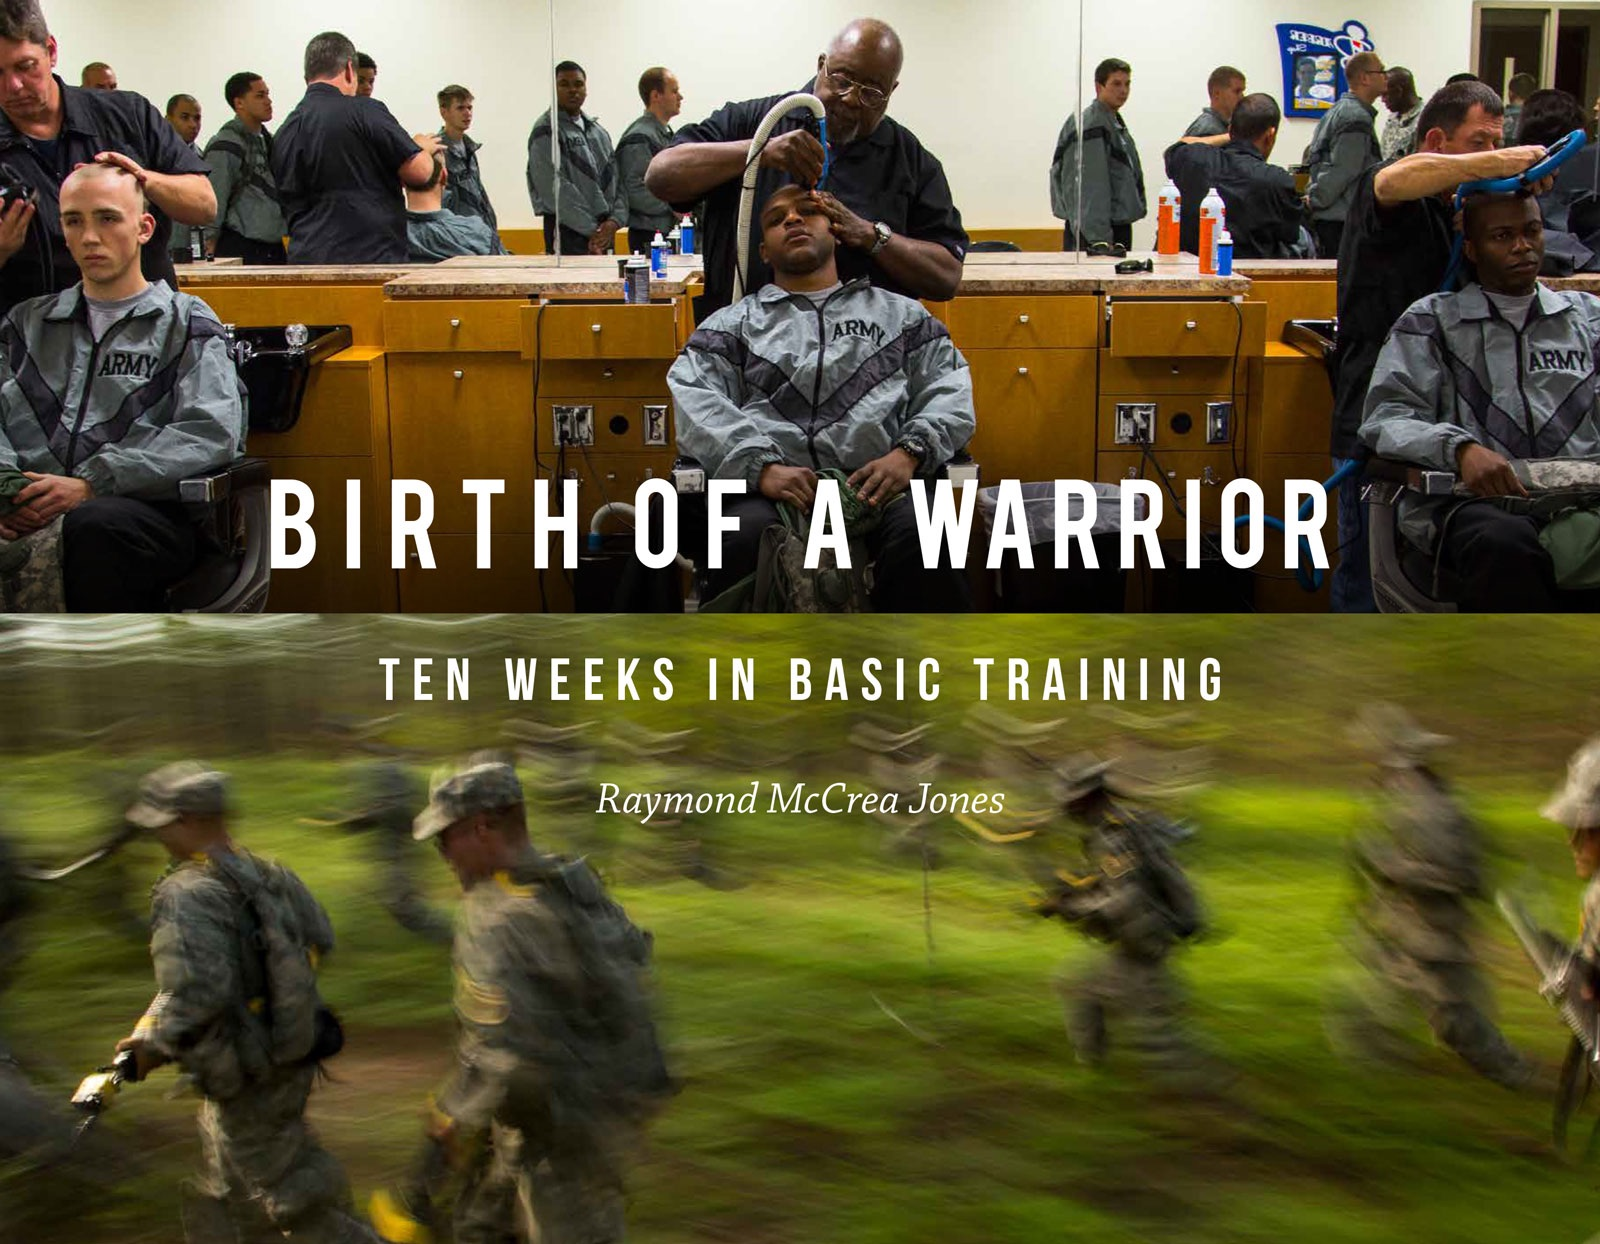 Birth of a Warrior: Ten Weeks in Basic Training by Raymond McCrea Jones